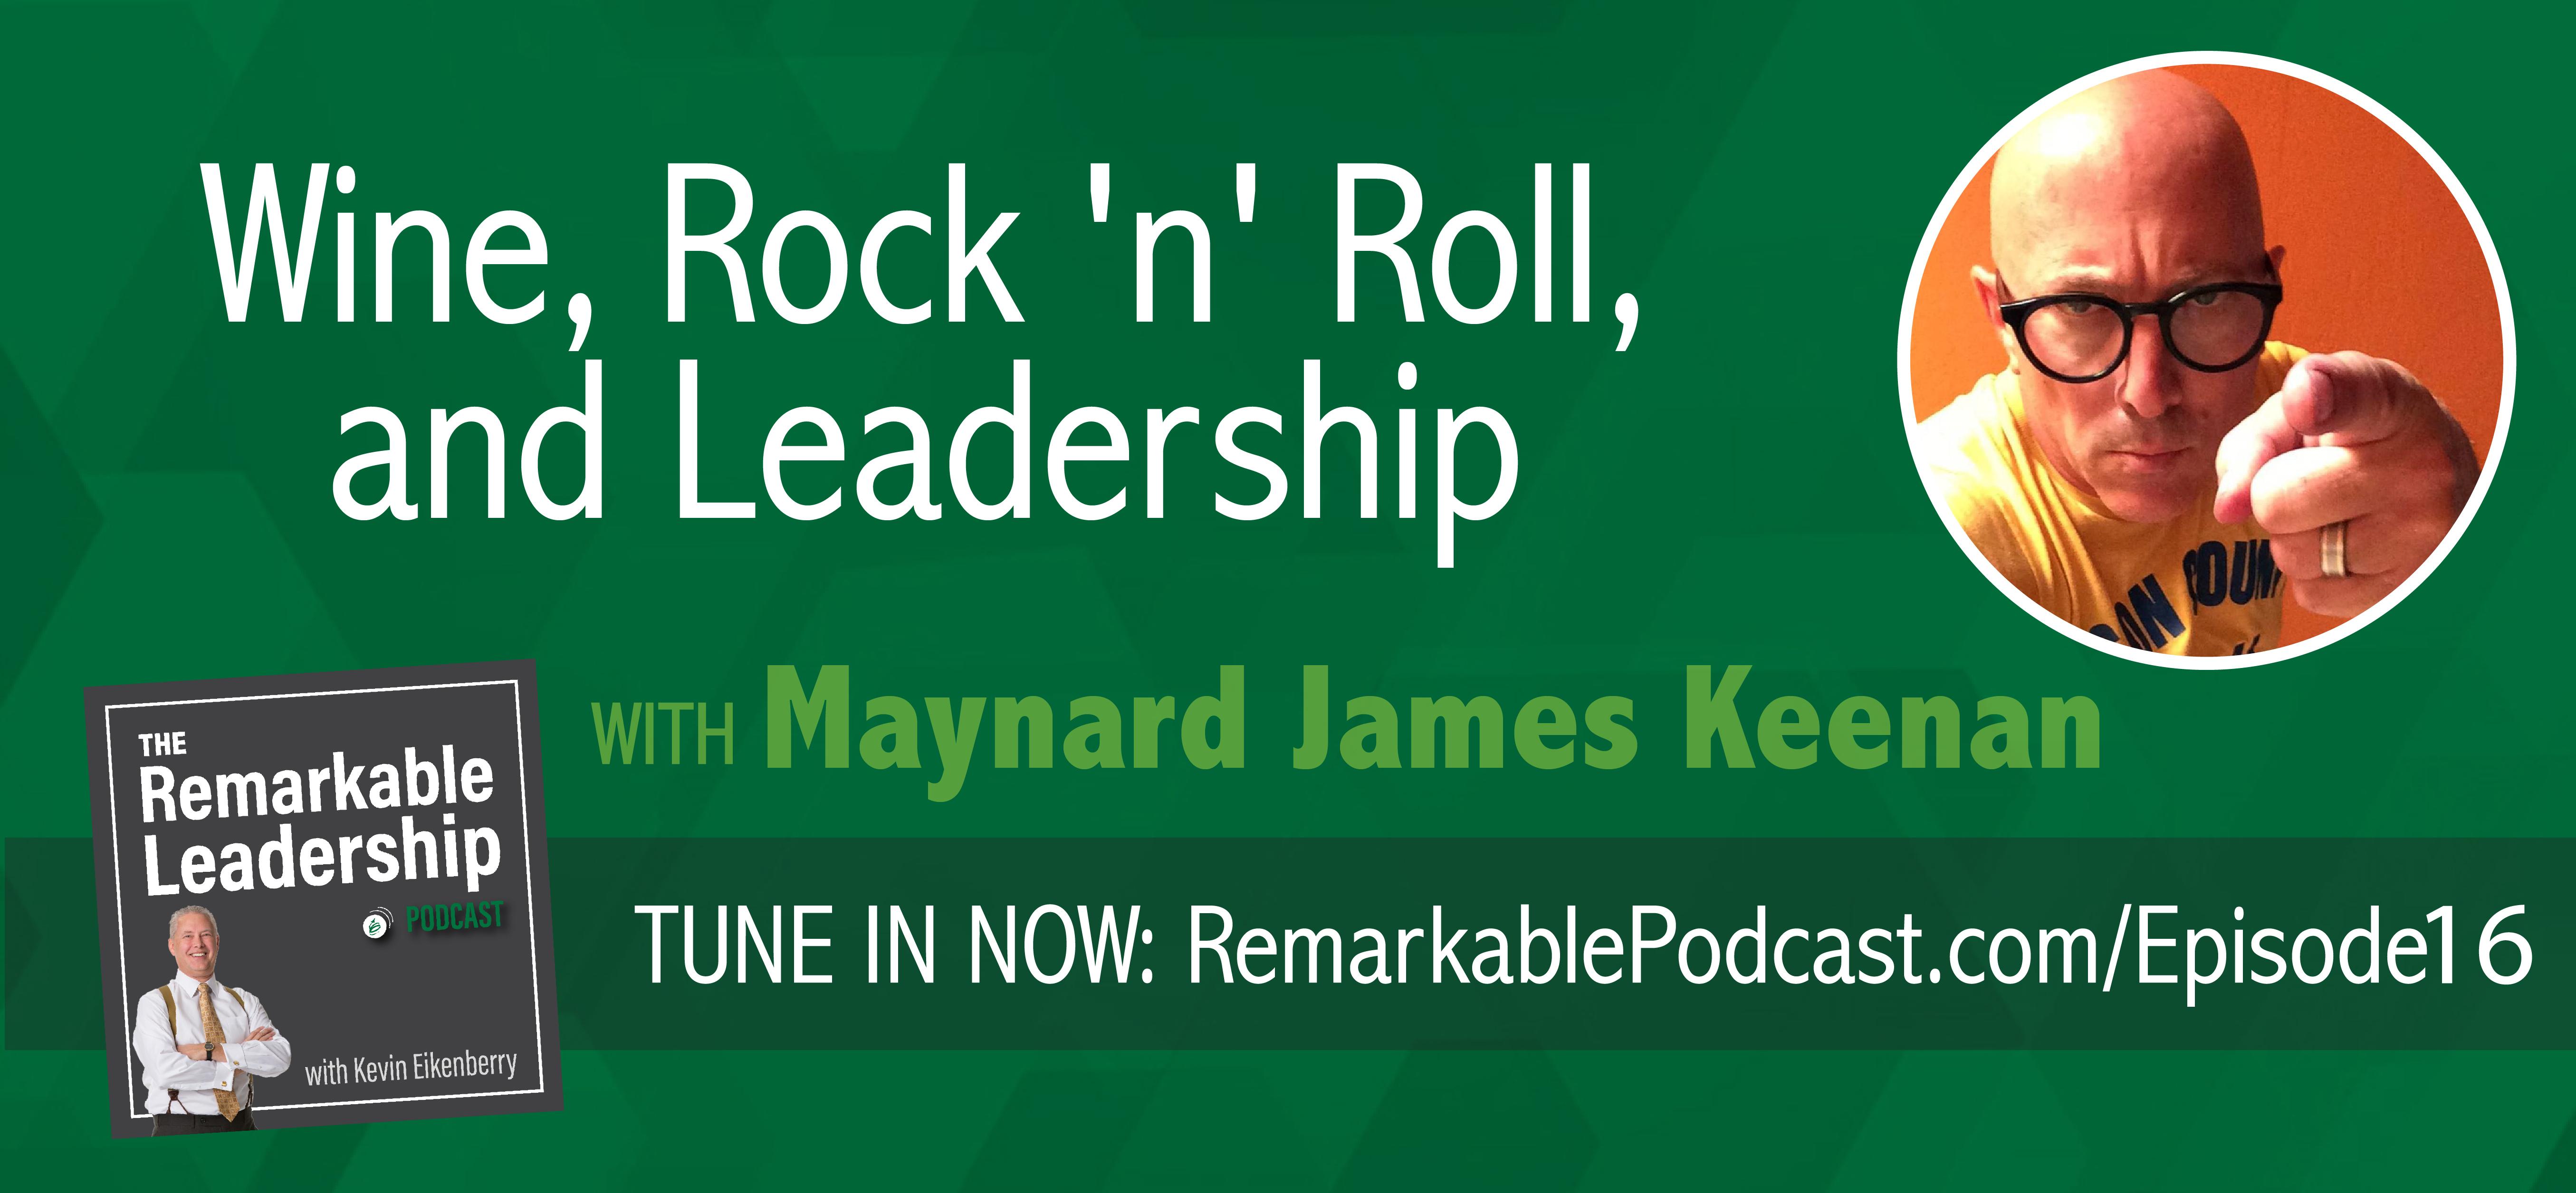 Wine, Rock 'n' Roll, and Leadership with Maynard James Keenan